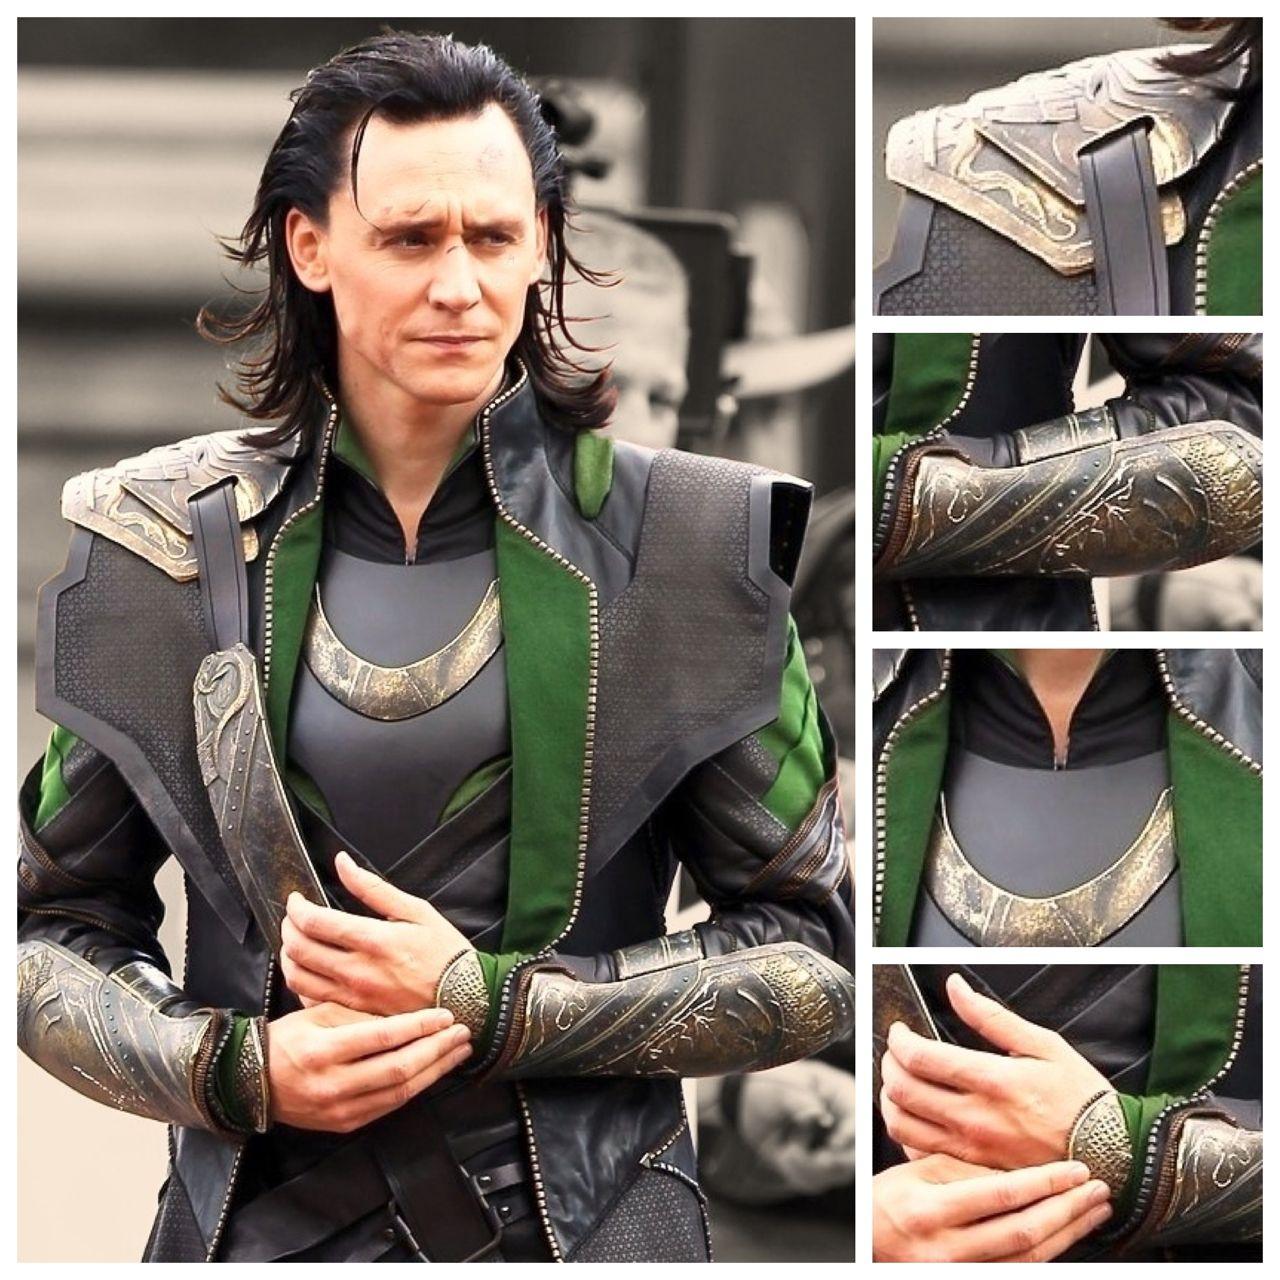 Loki From The Avengers